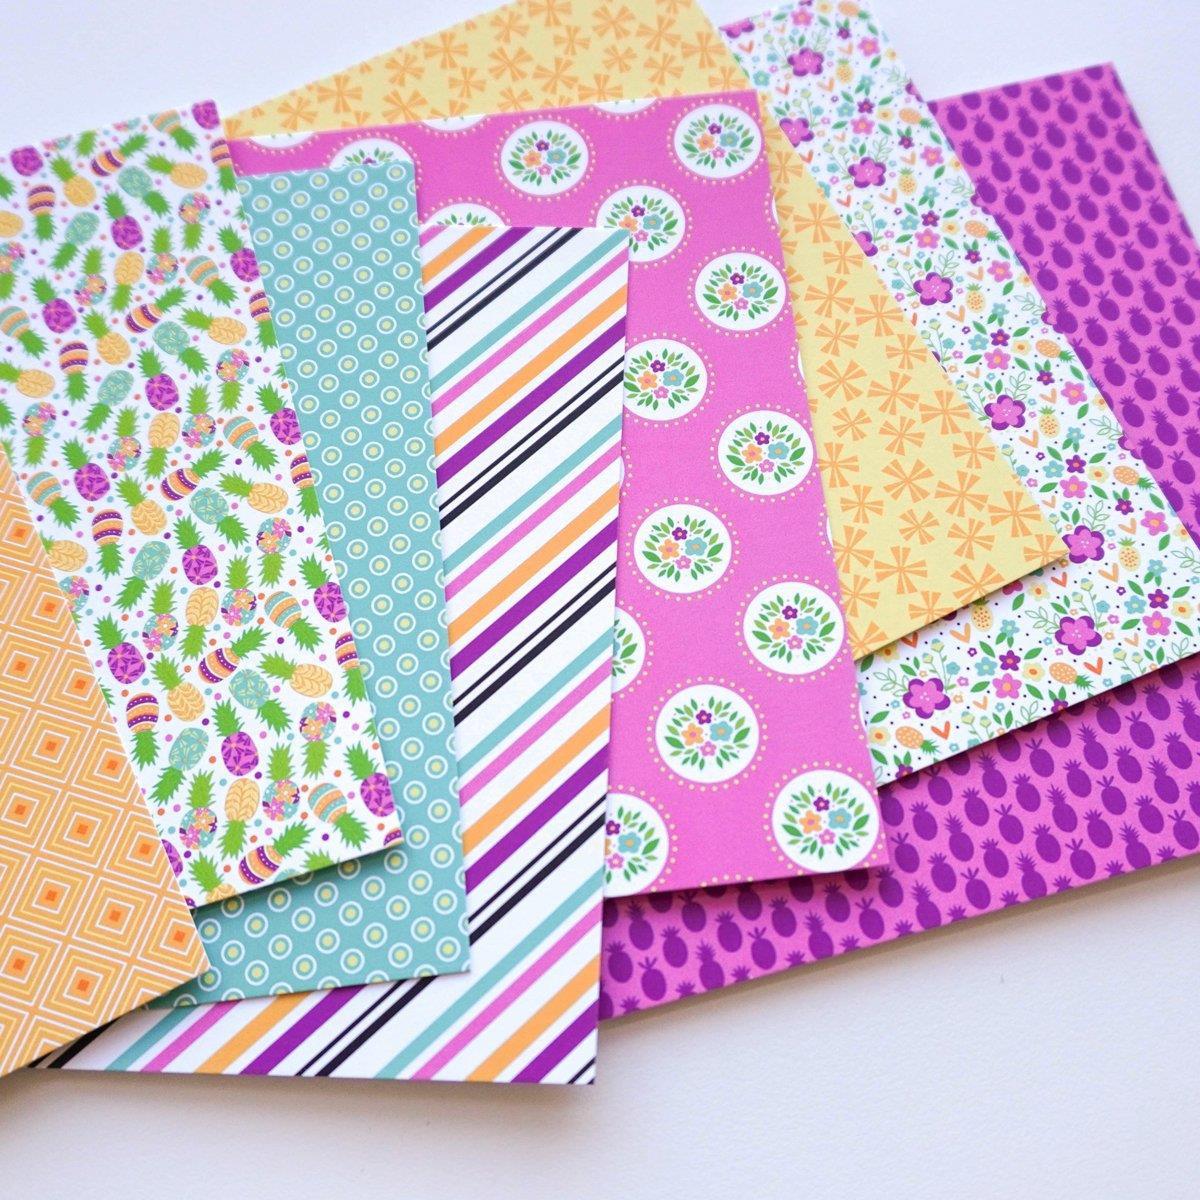 Preppy Prints, Catherine Pooler Patterned Paper -